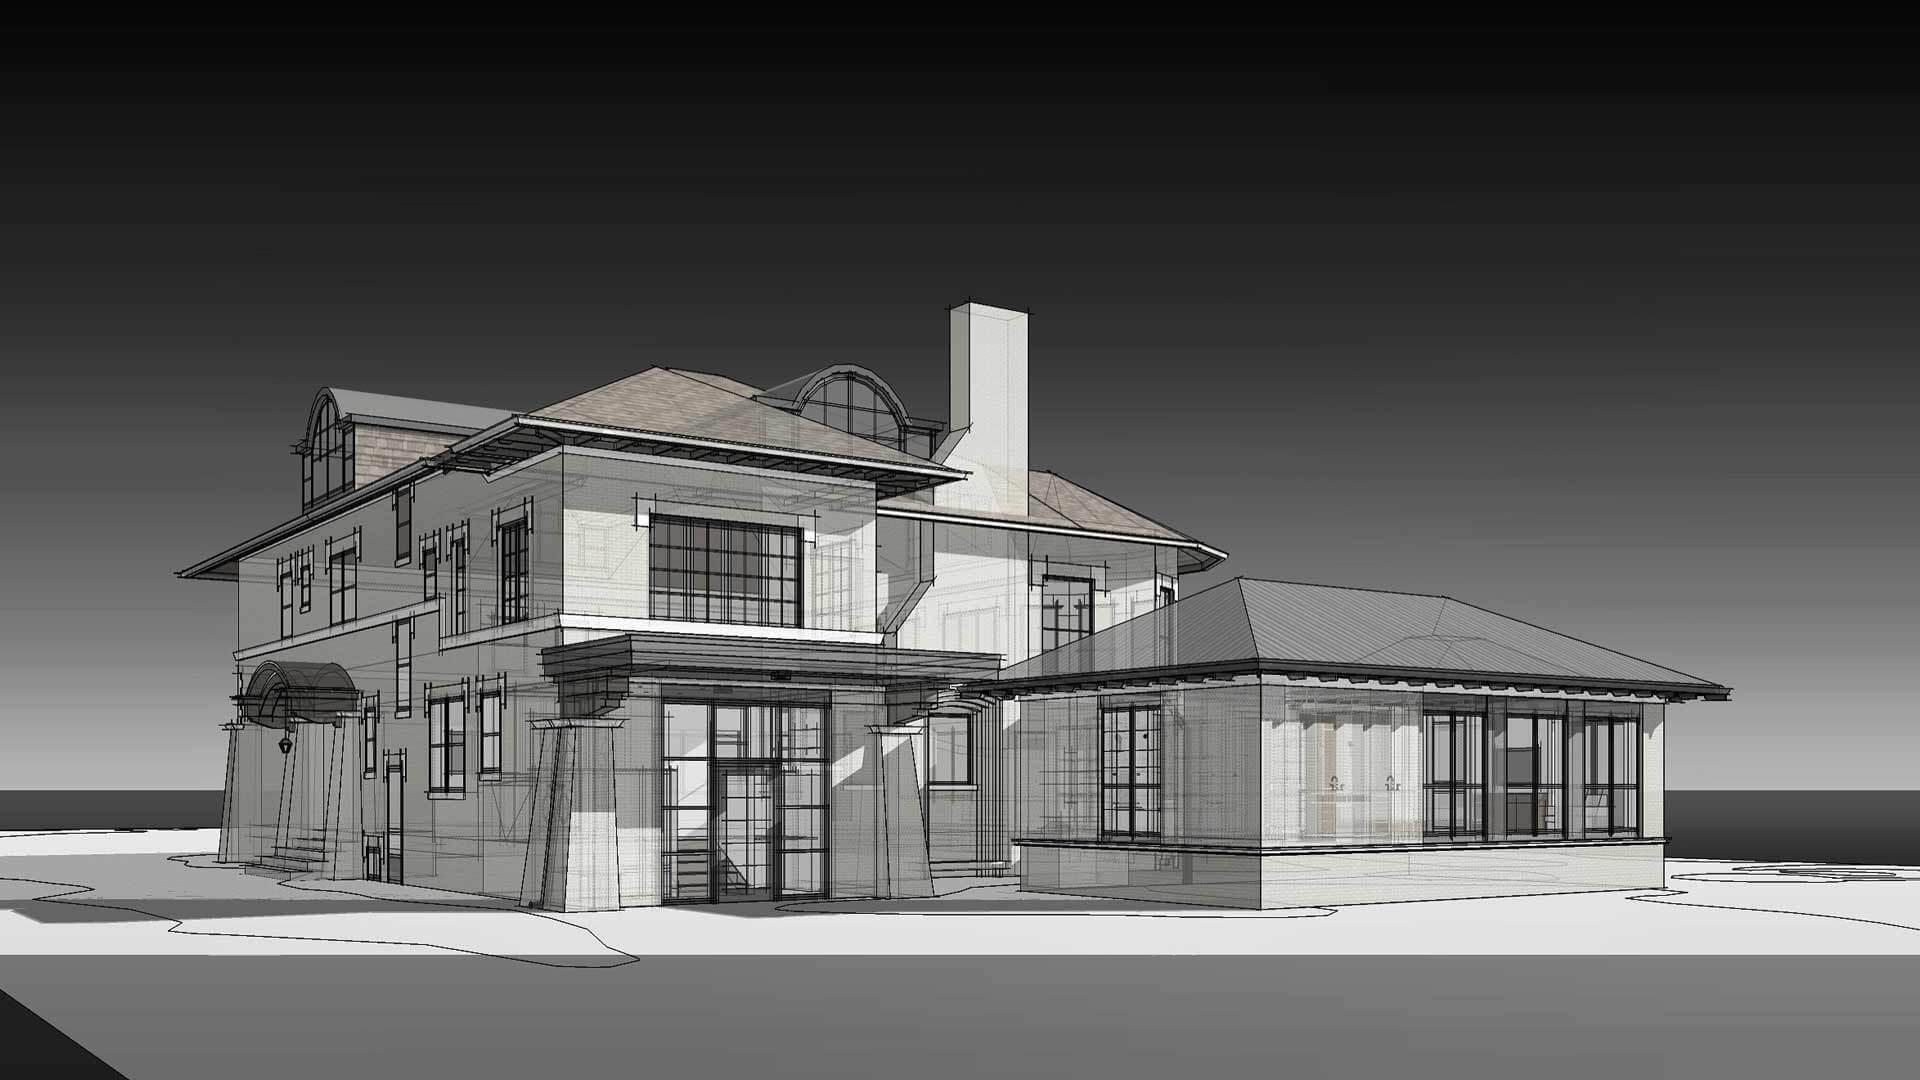 Rear Elevation-Rendering - Eclectic Italian Renaissance Addition, Washington Boulevard, Indianapolis